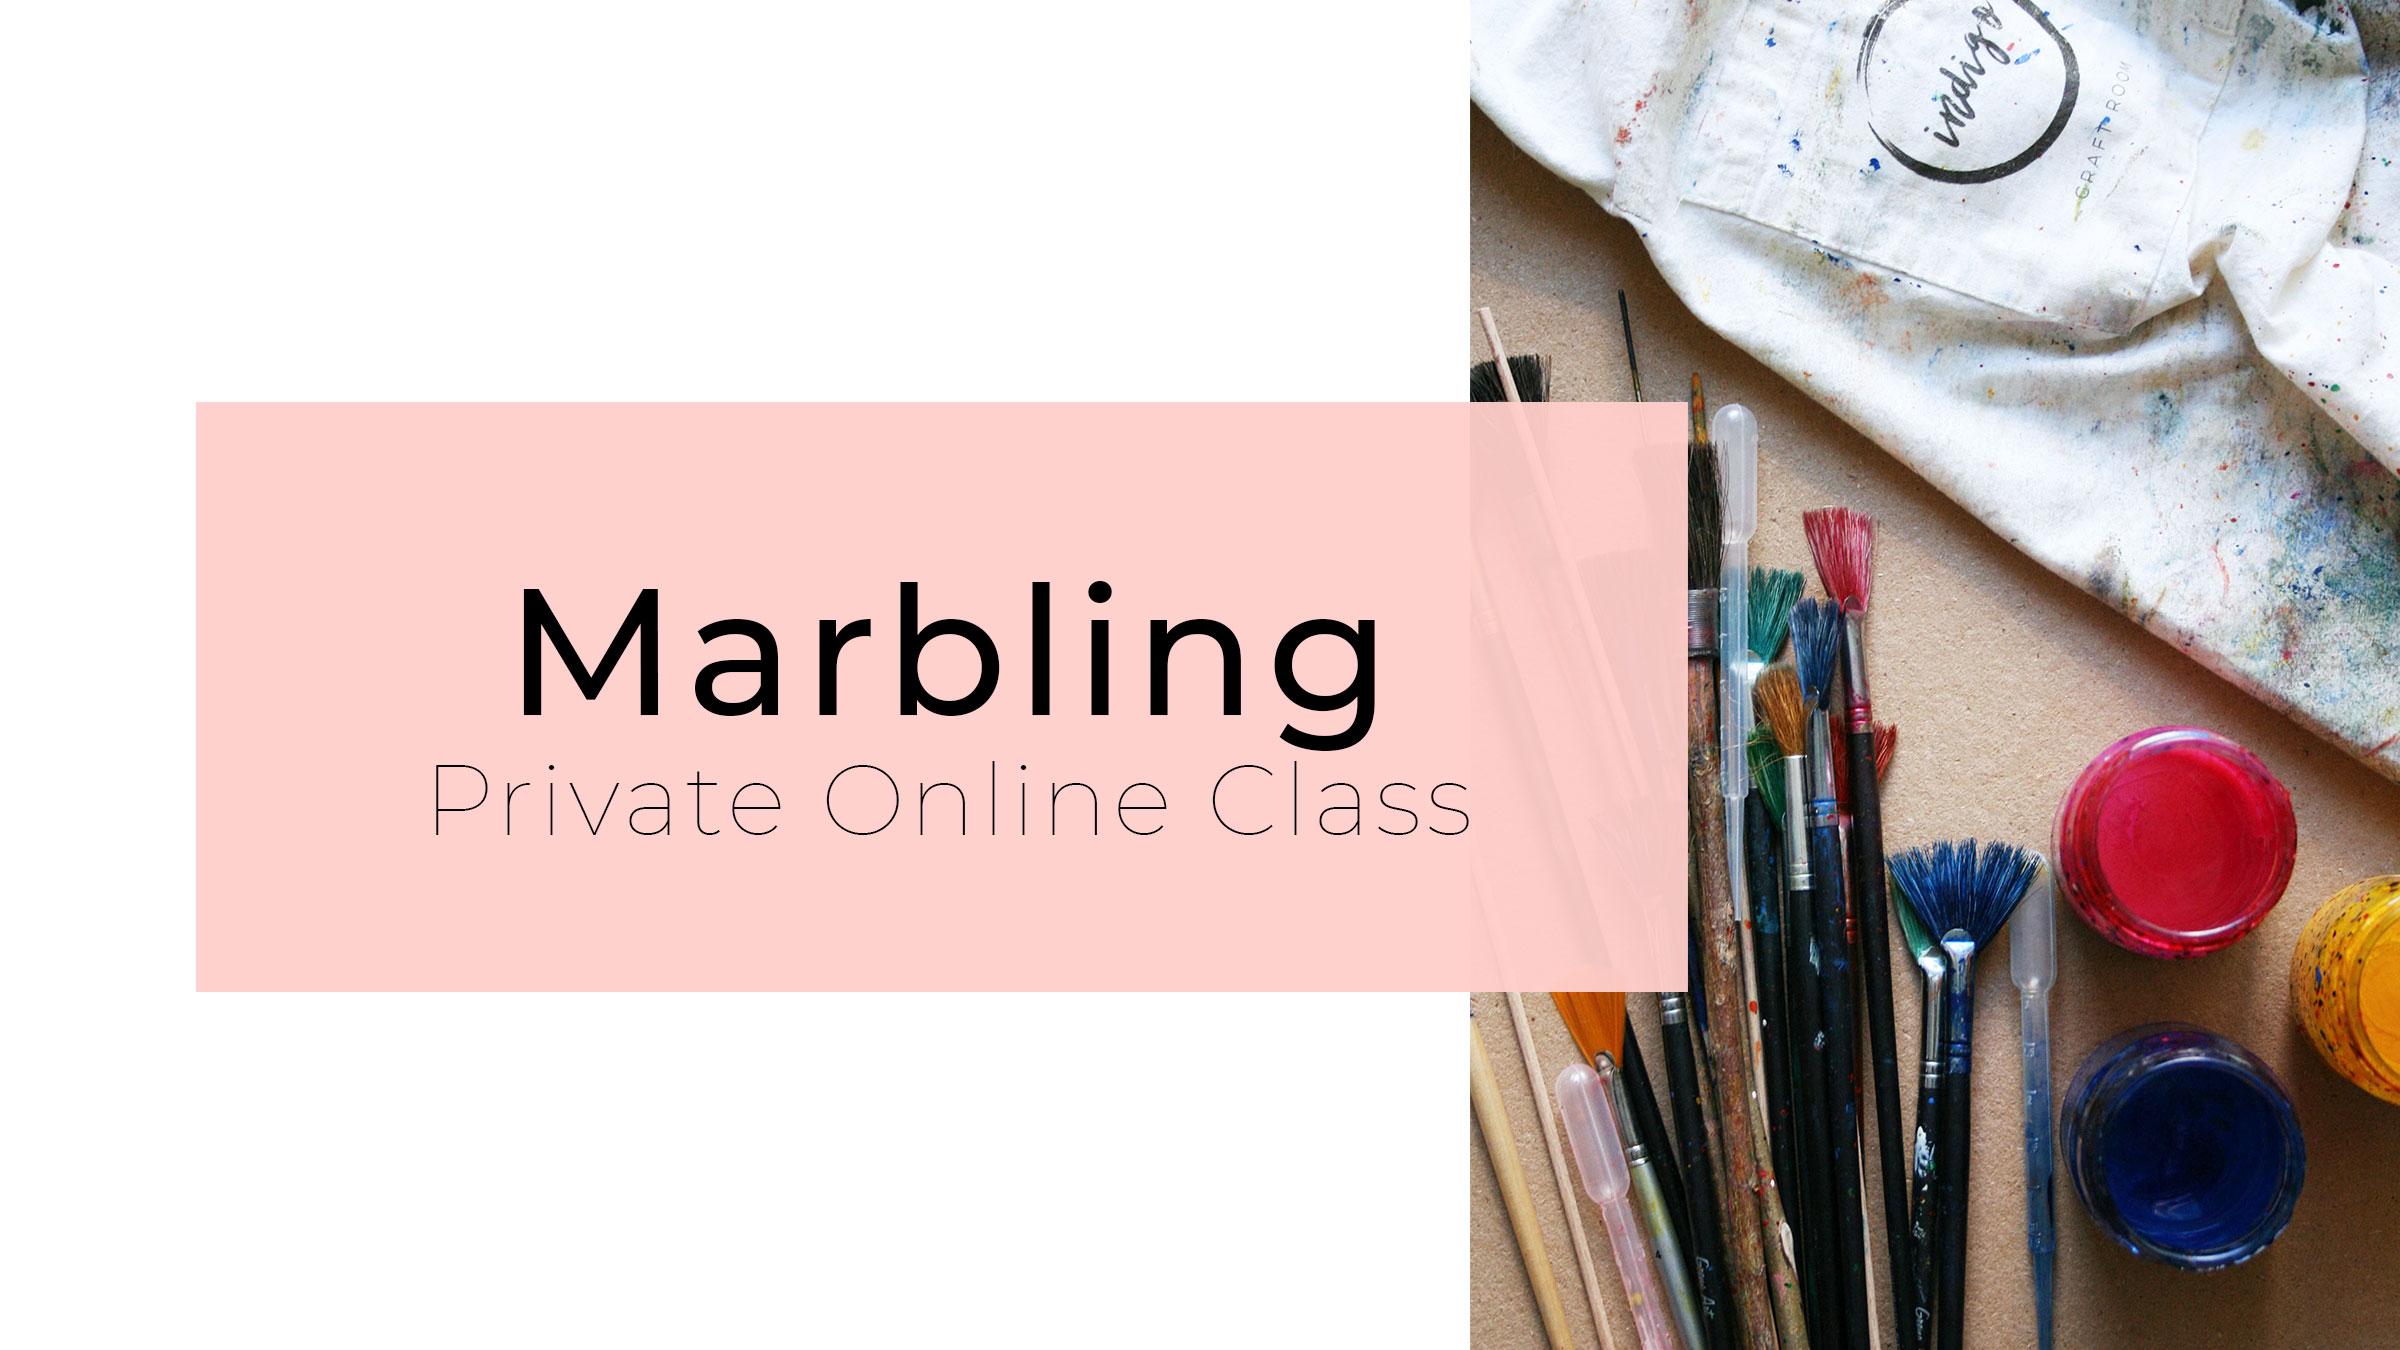 marbling-private-online-class-indigocraftroom-0